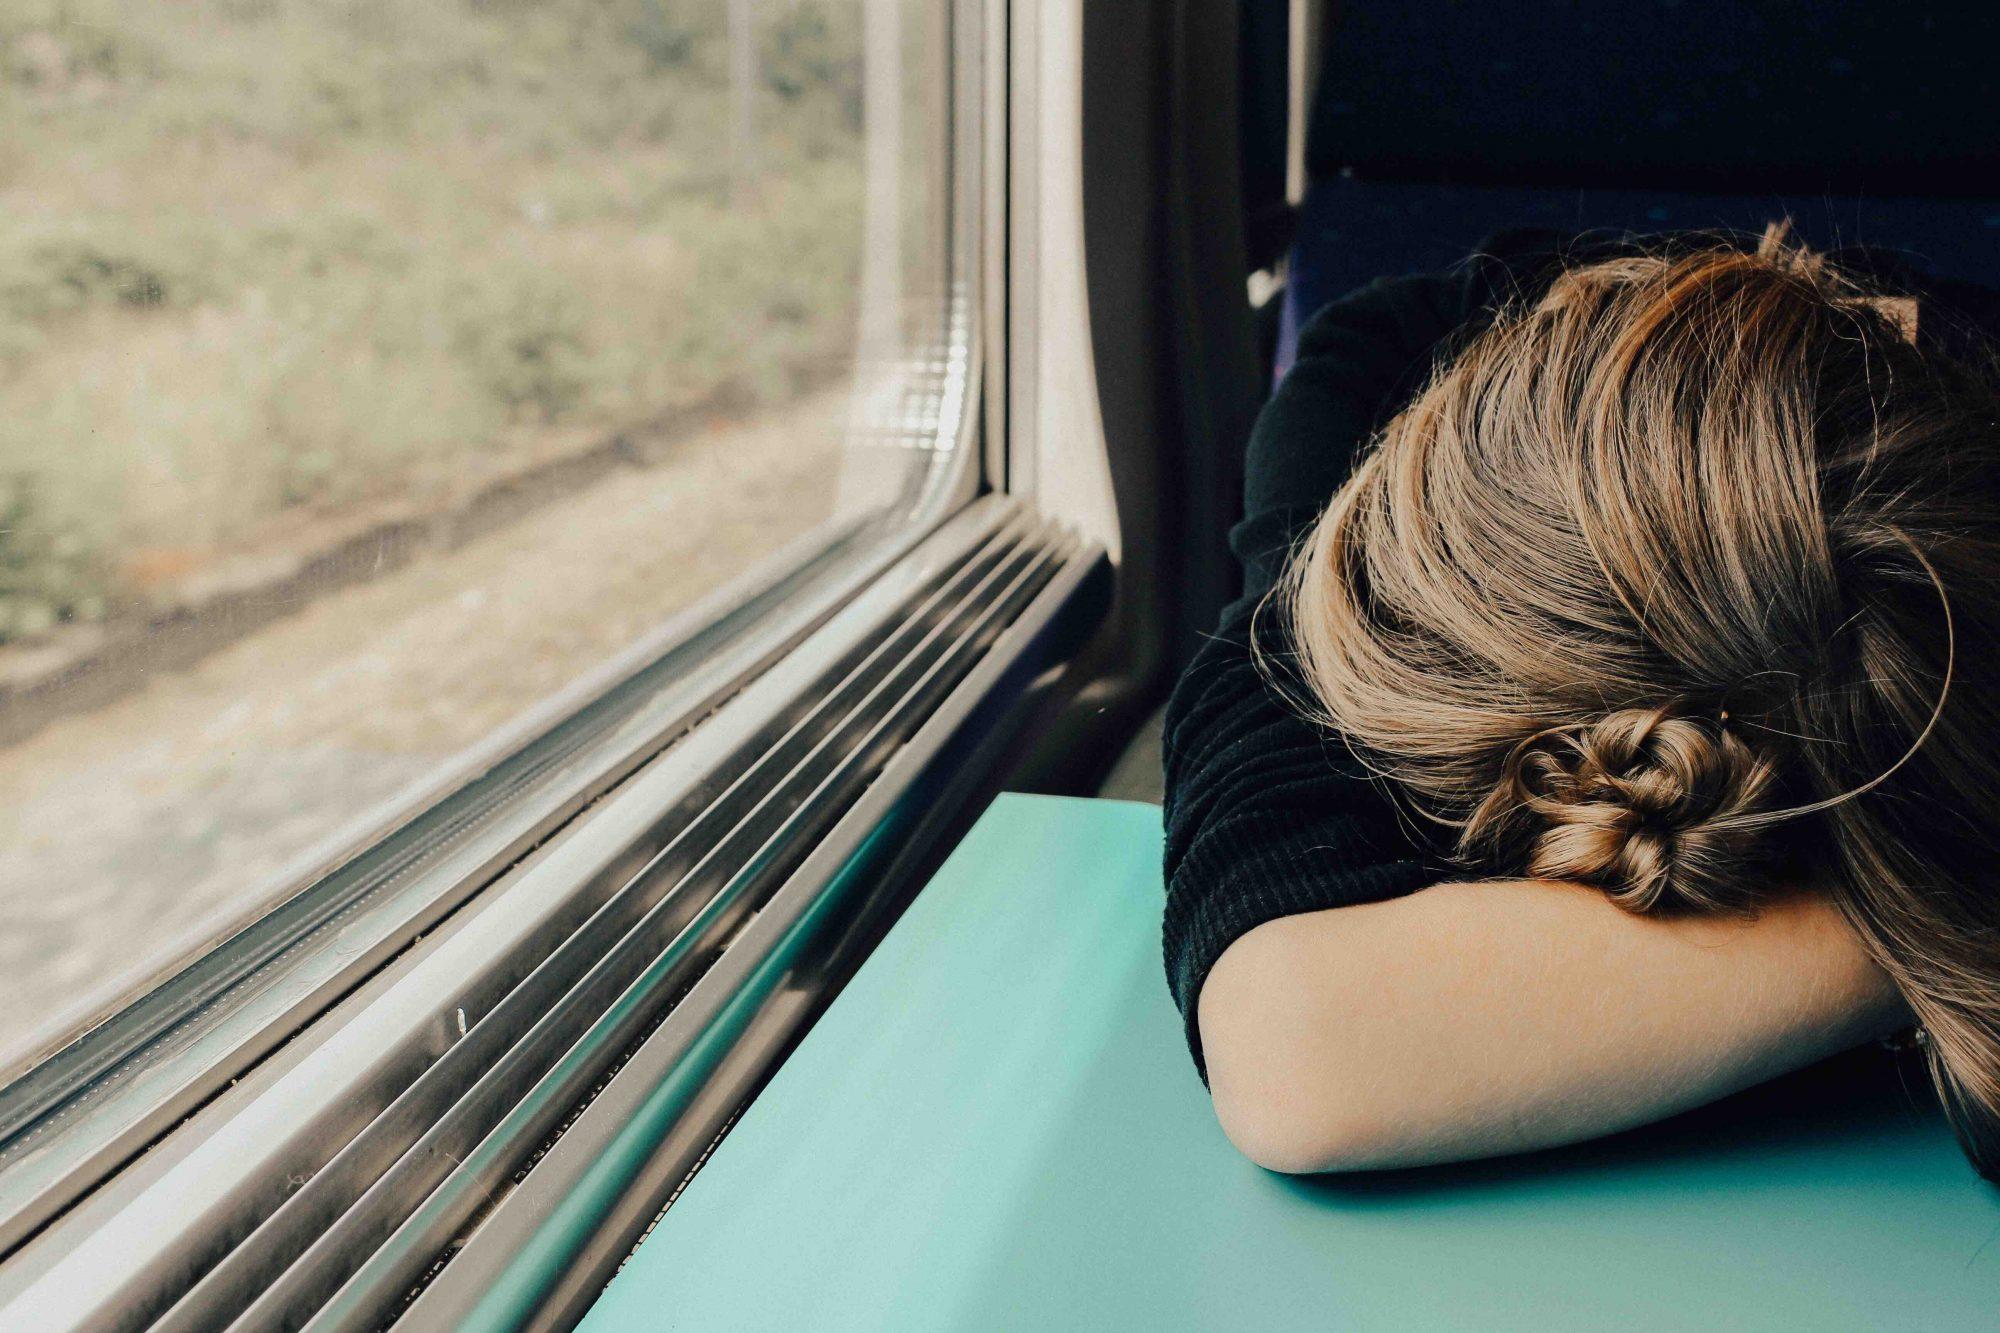 woman-sleeping-on-train-window